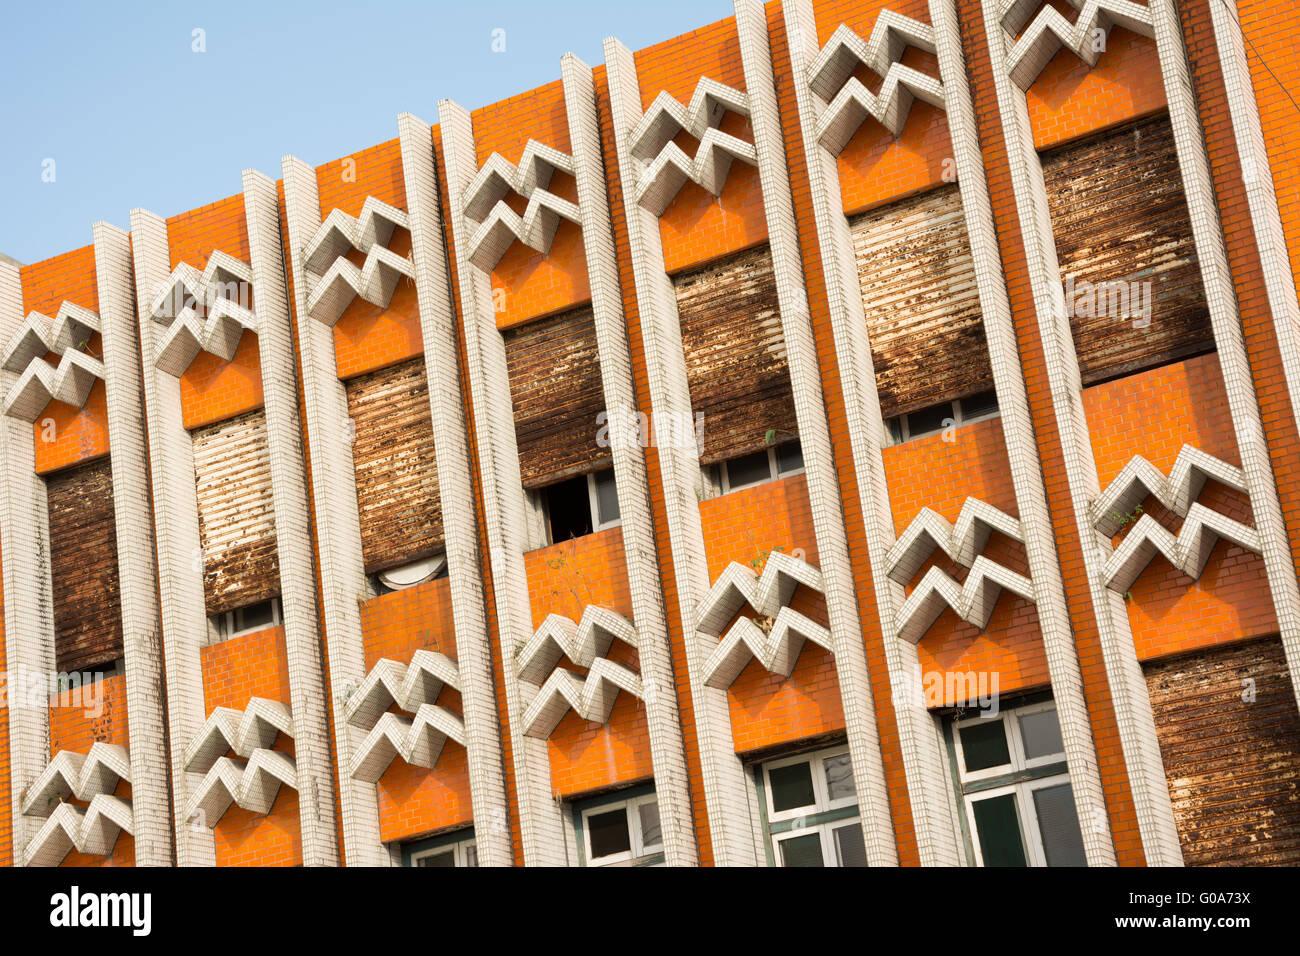 buildings - Stock Image